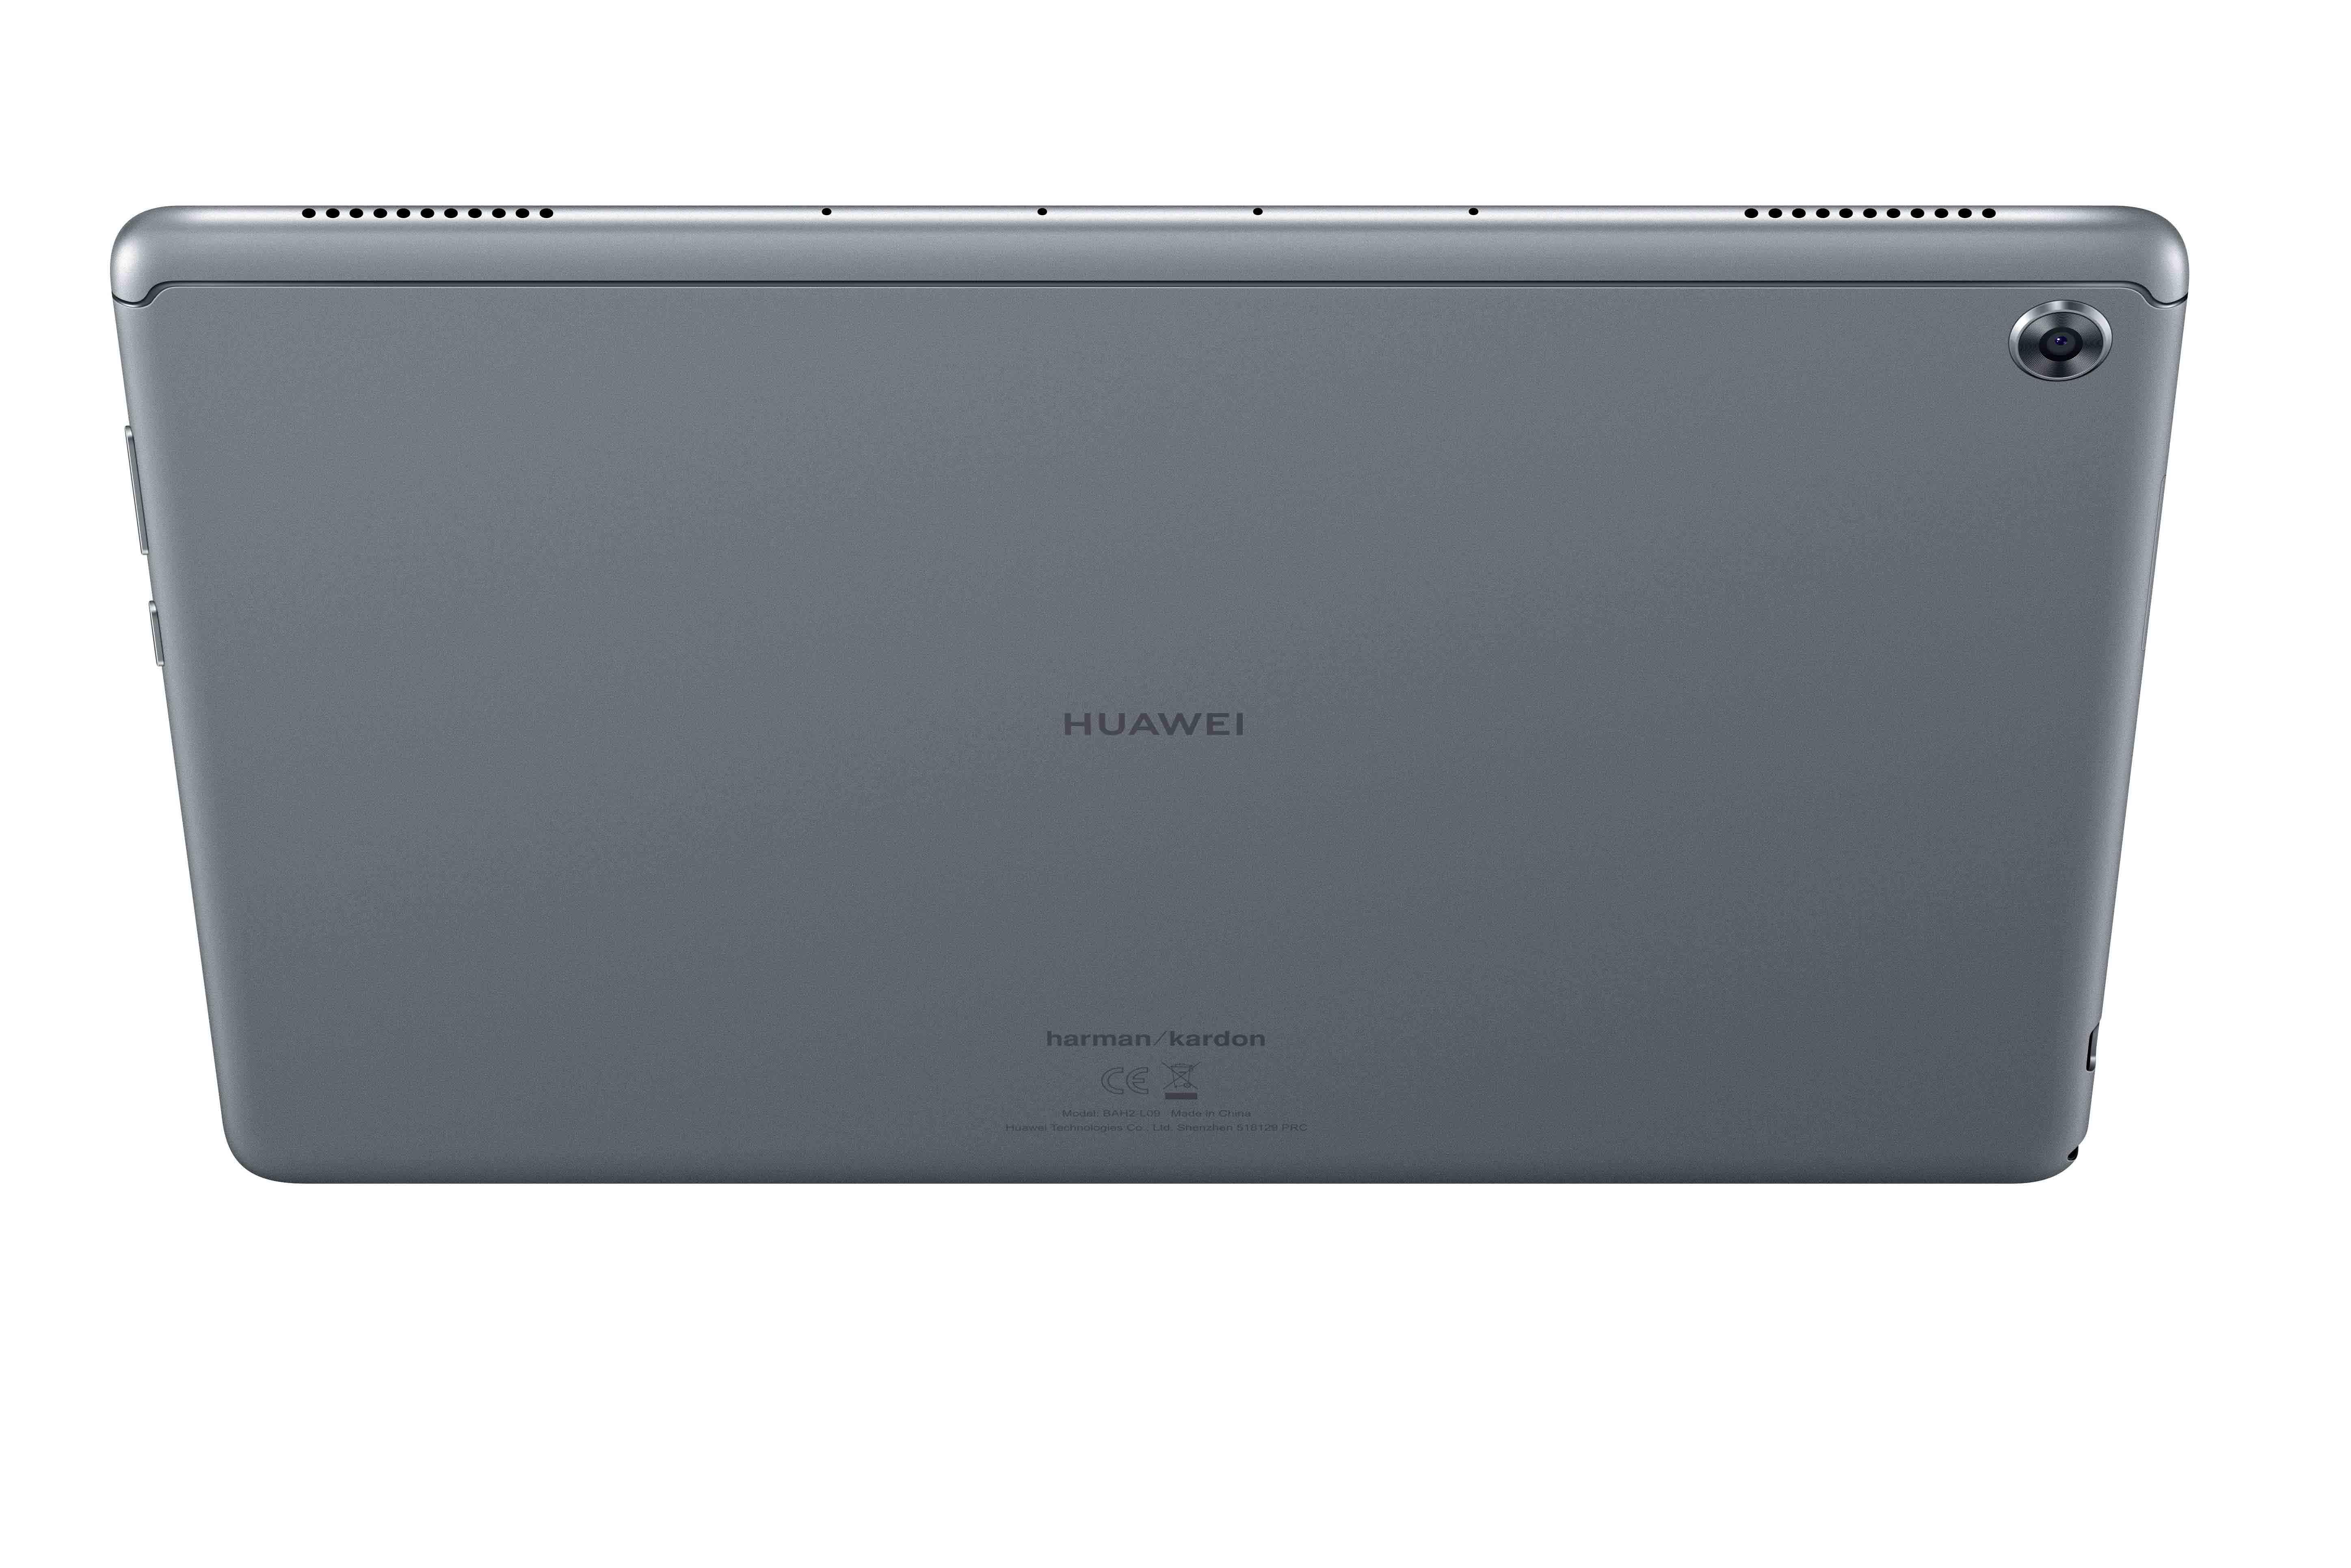 Huawei mediapad m5 lite display showing its back